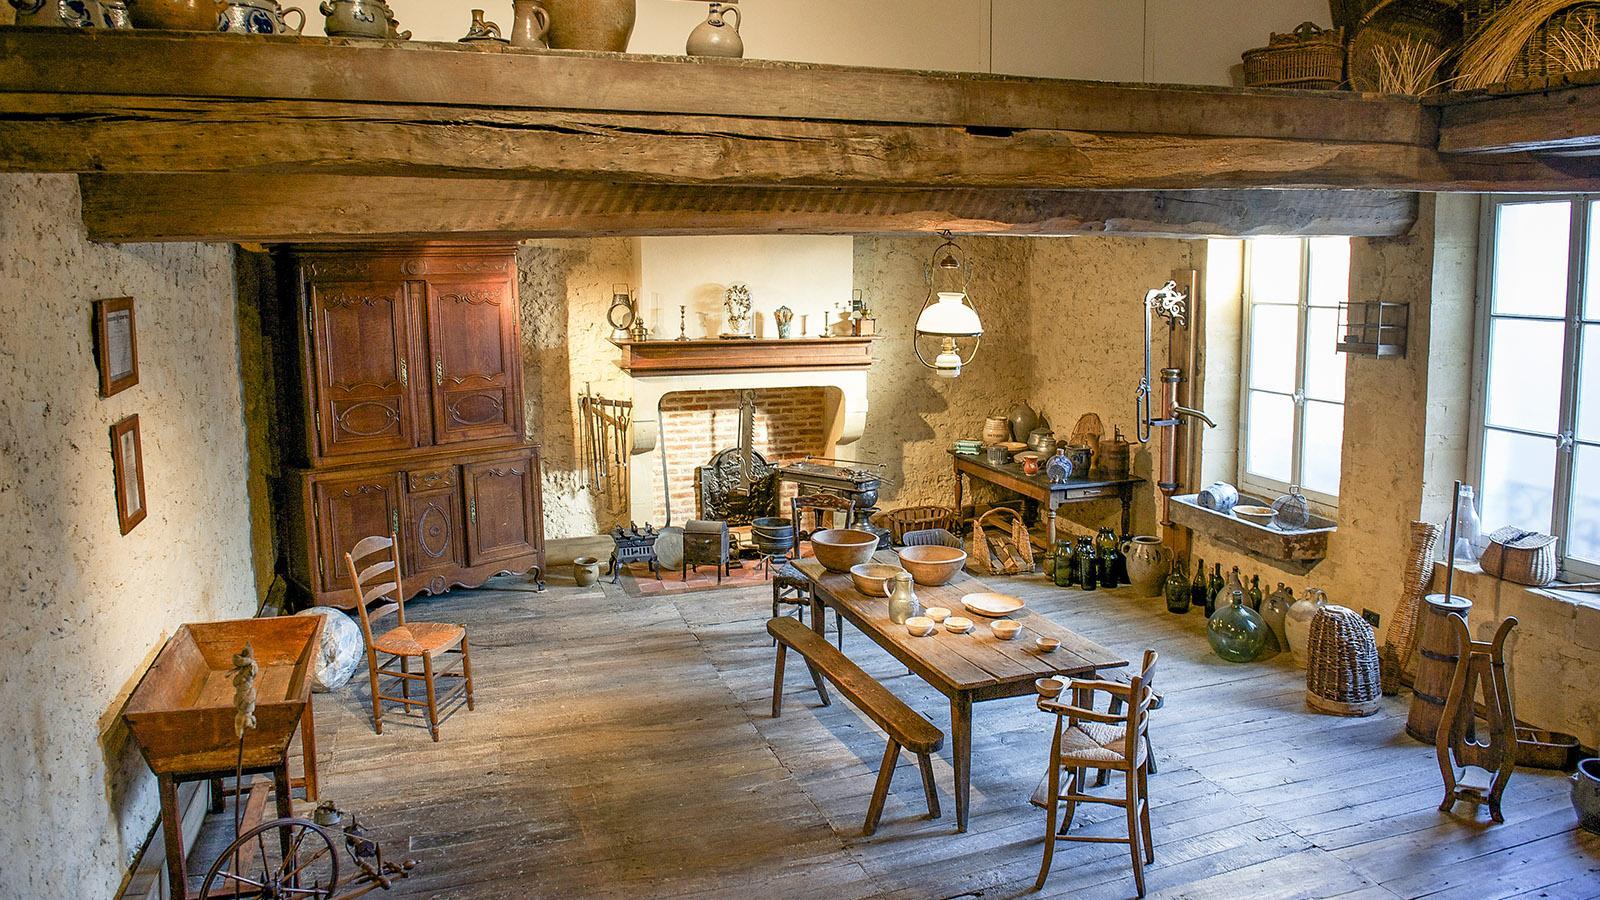 Charleville-Mézières: Bauernstube im Regionalmuseum. Foto: Hilke Maunder